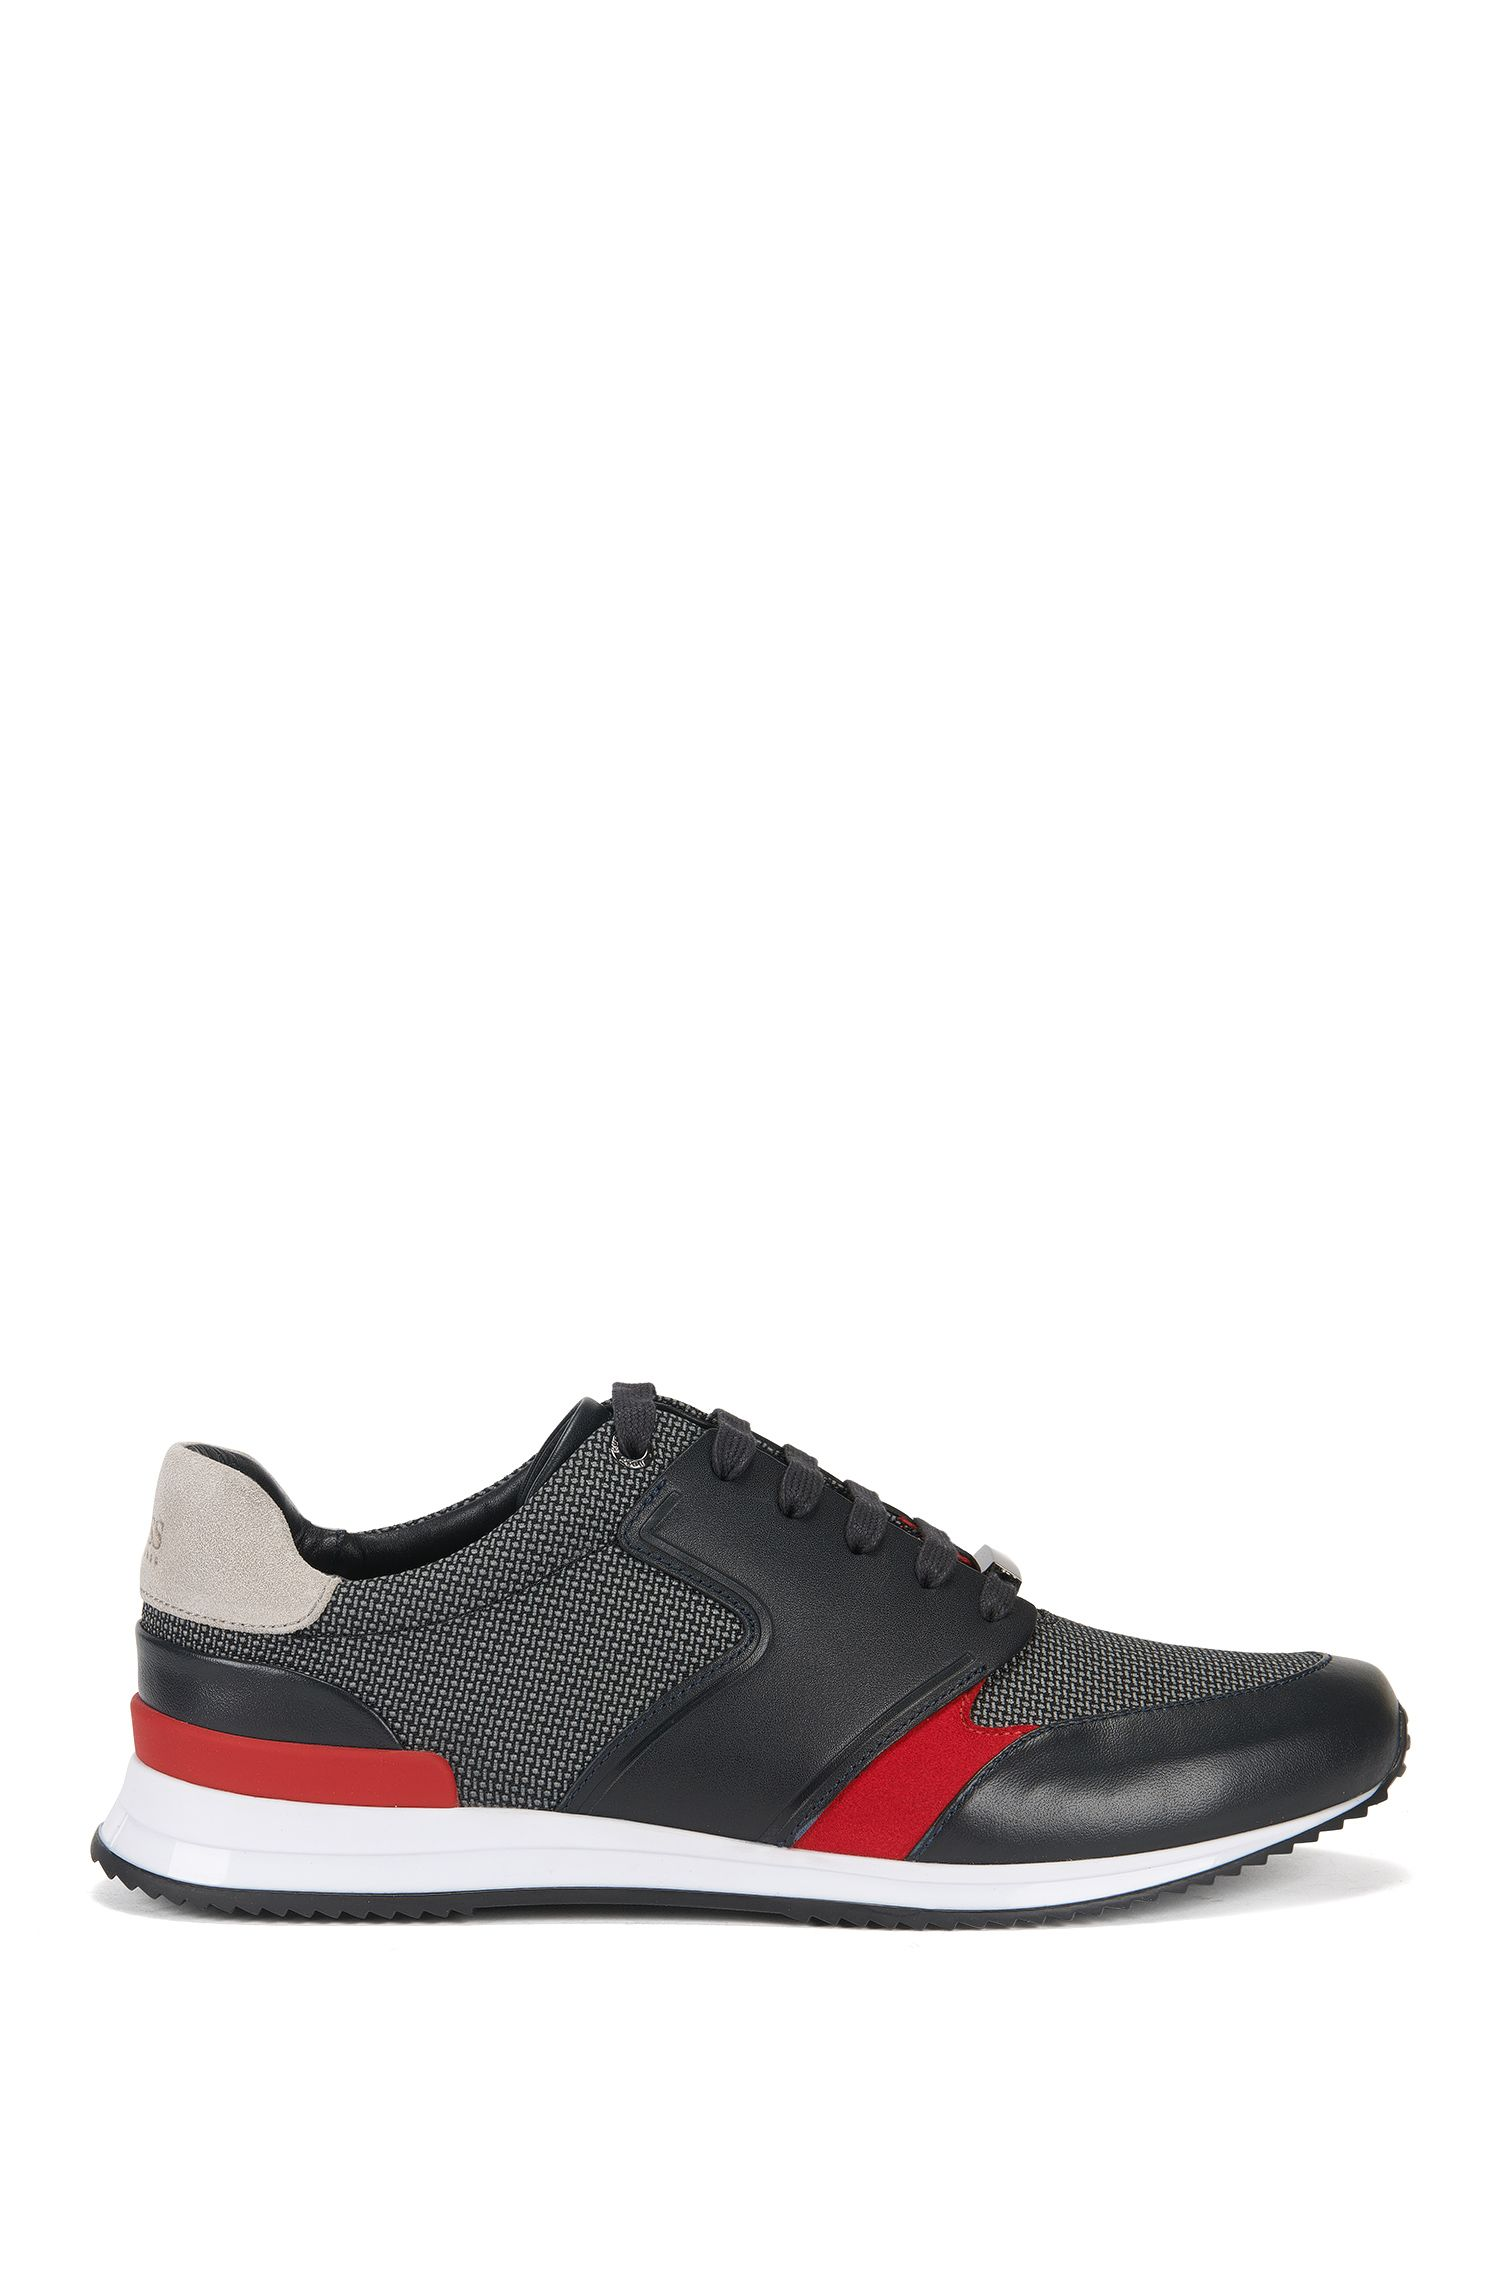 Sneakers aus Leder und Material-Mix